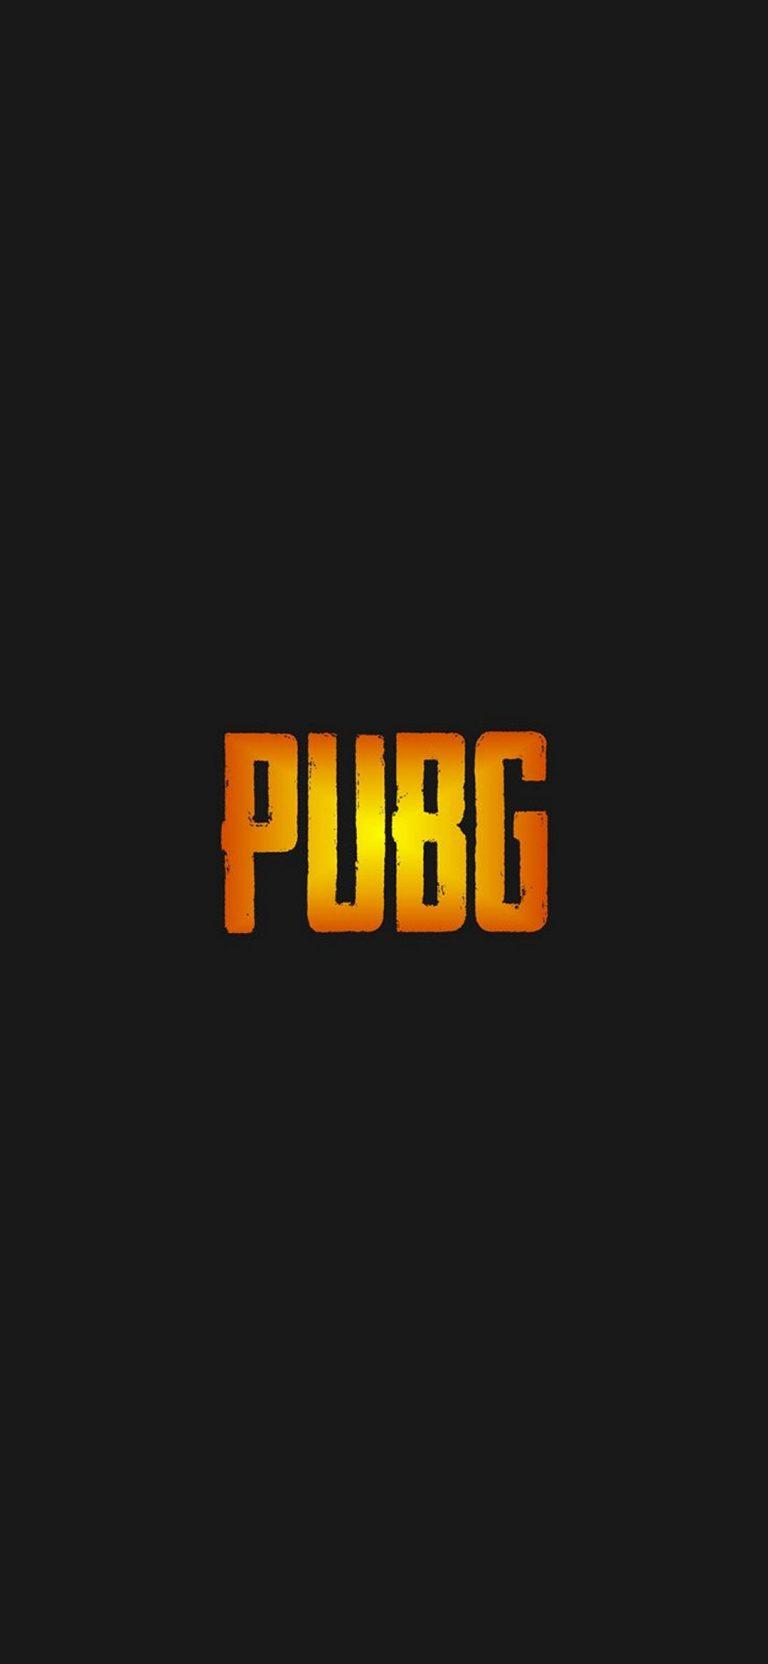 PUBG Phone Wallpaper 26 1080x2340 768x1664